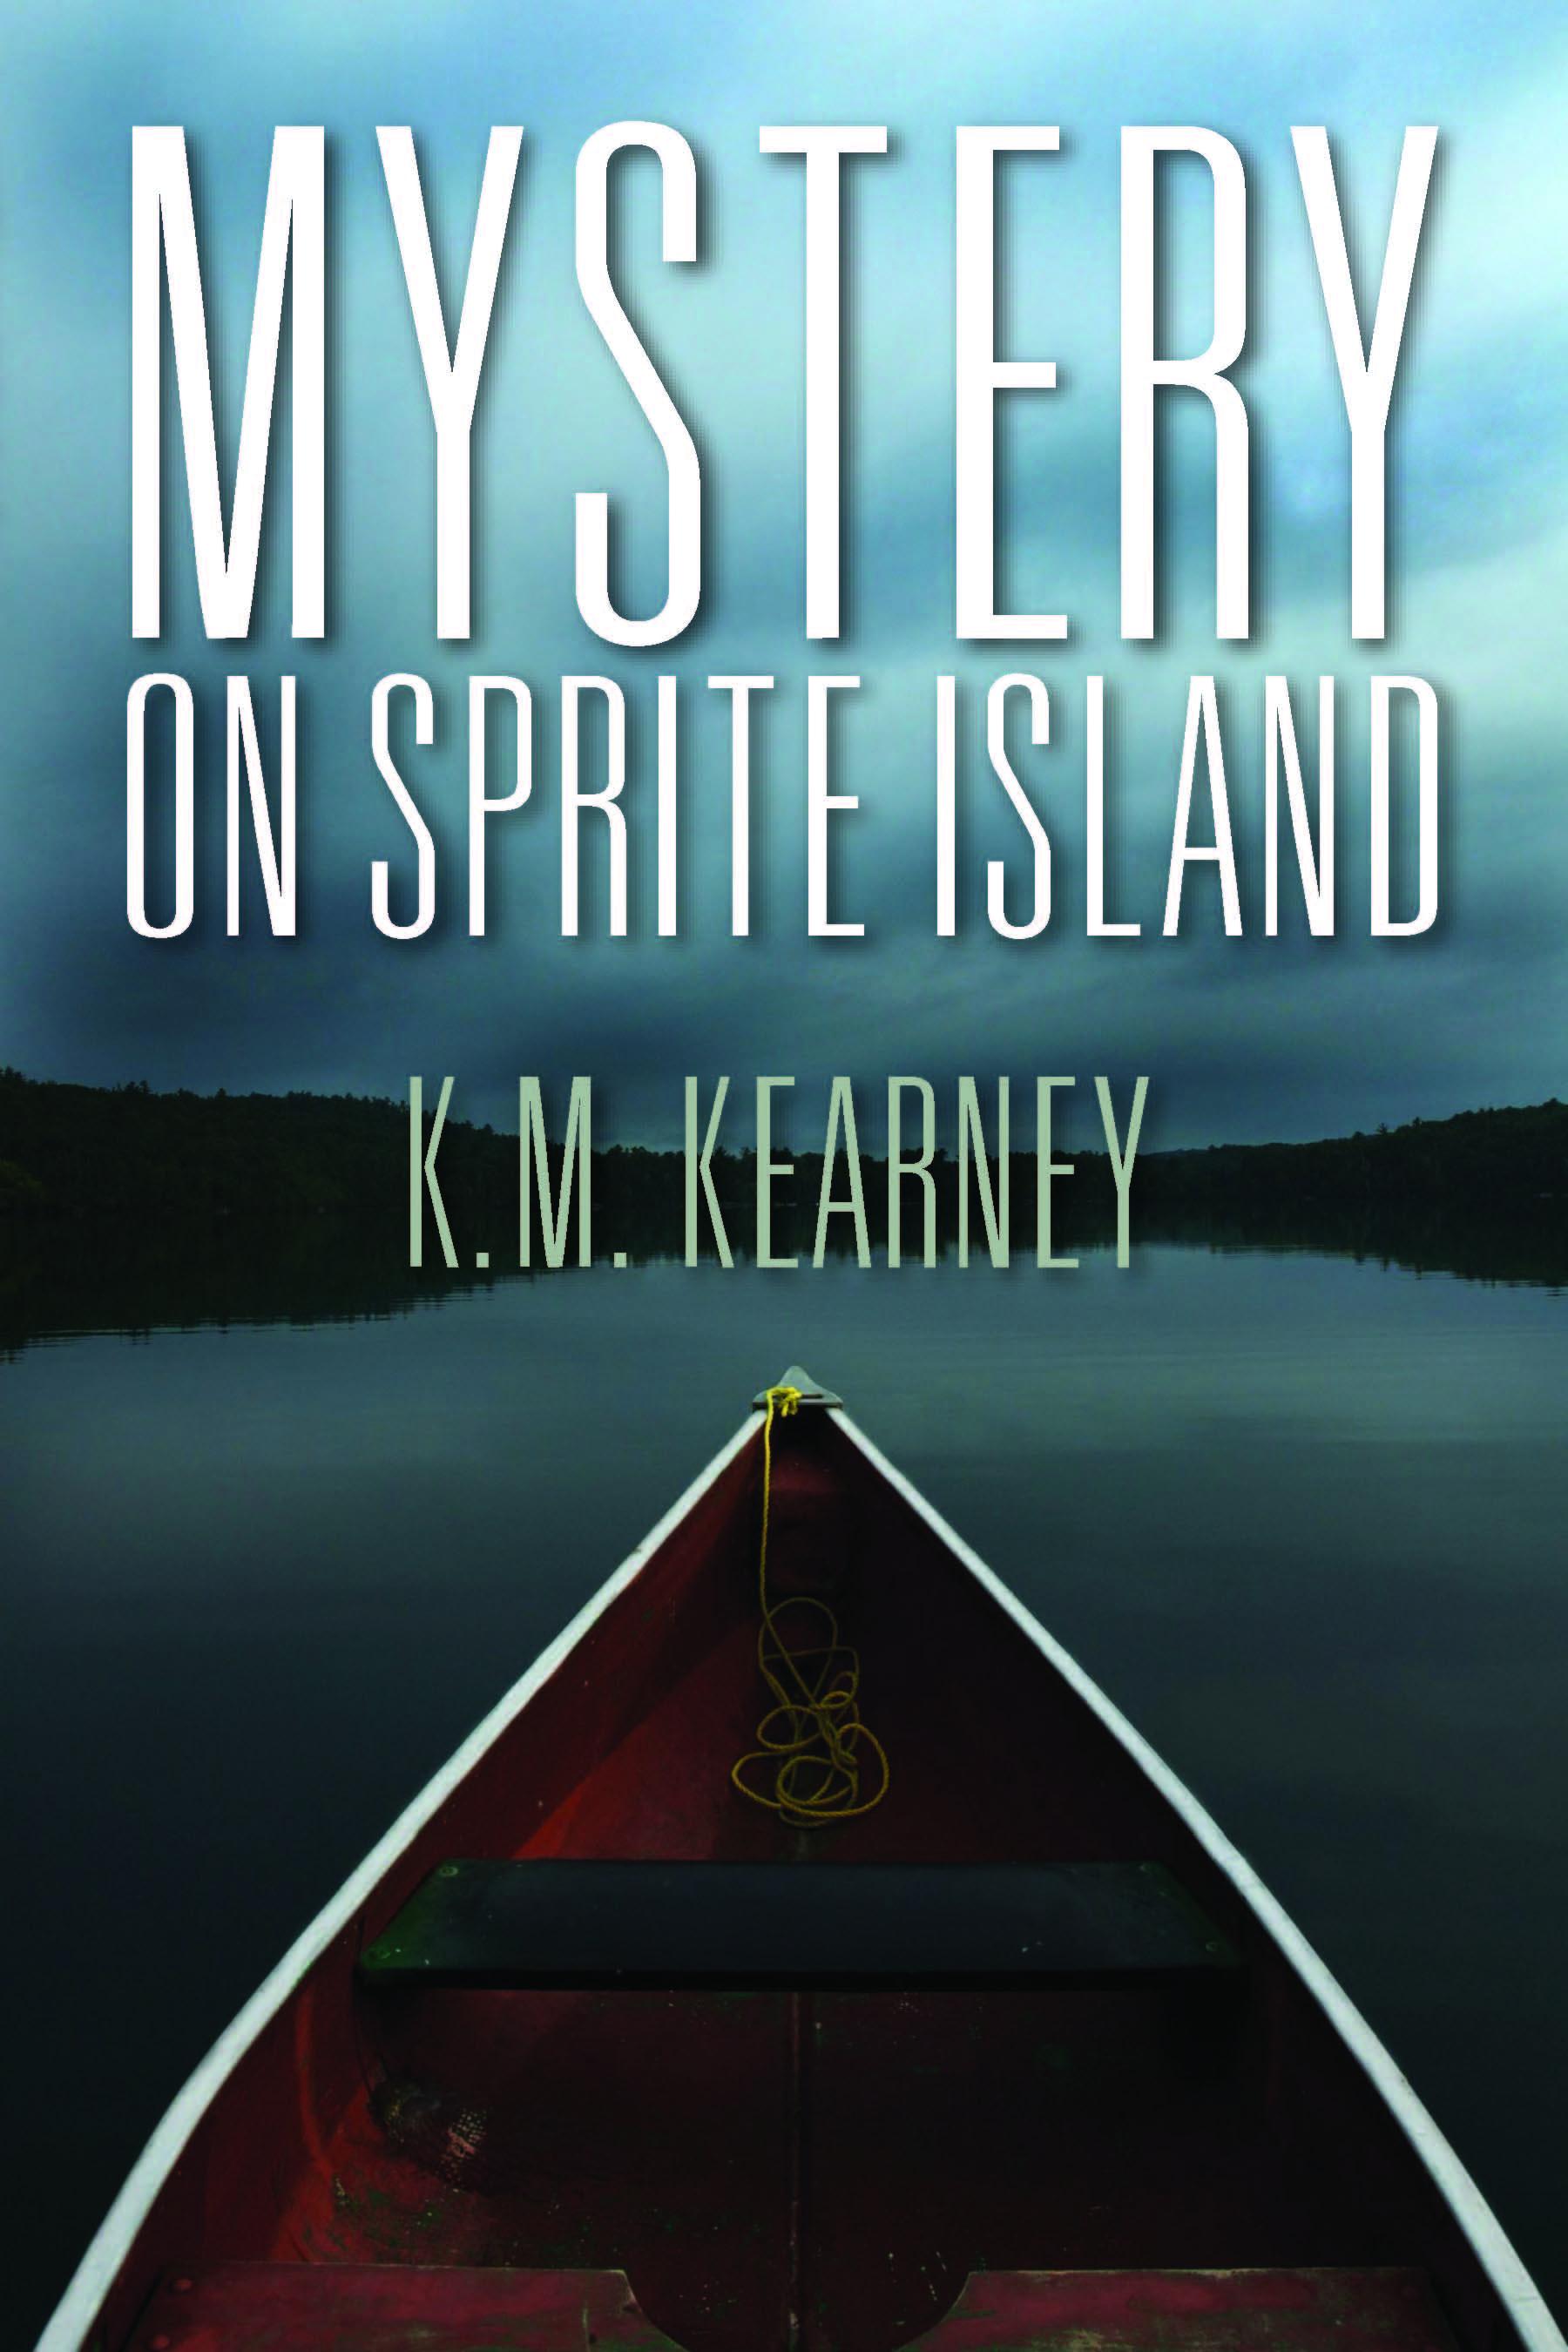 Mystery on Sprite Island